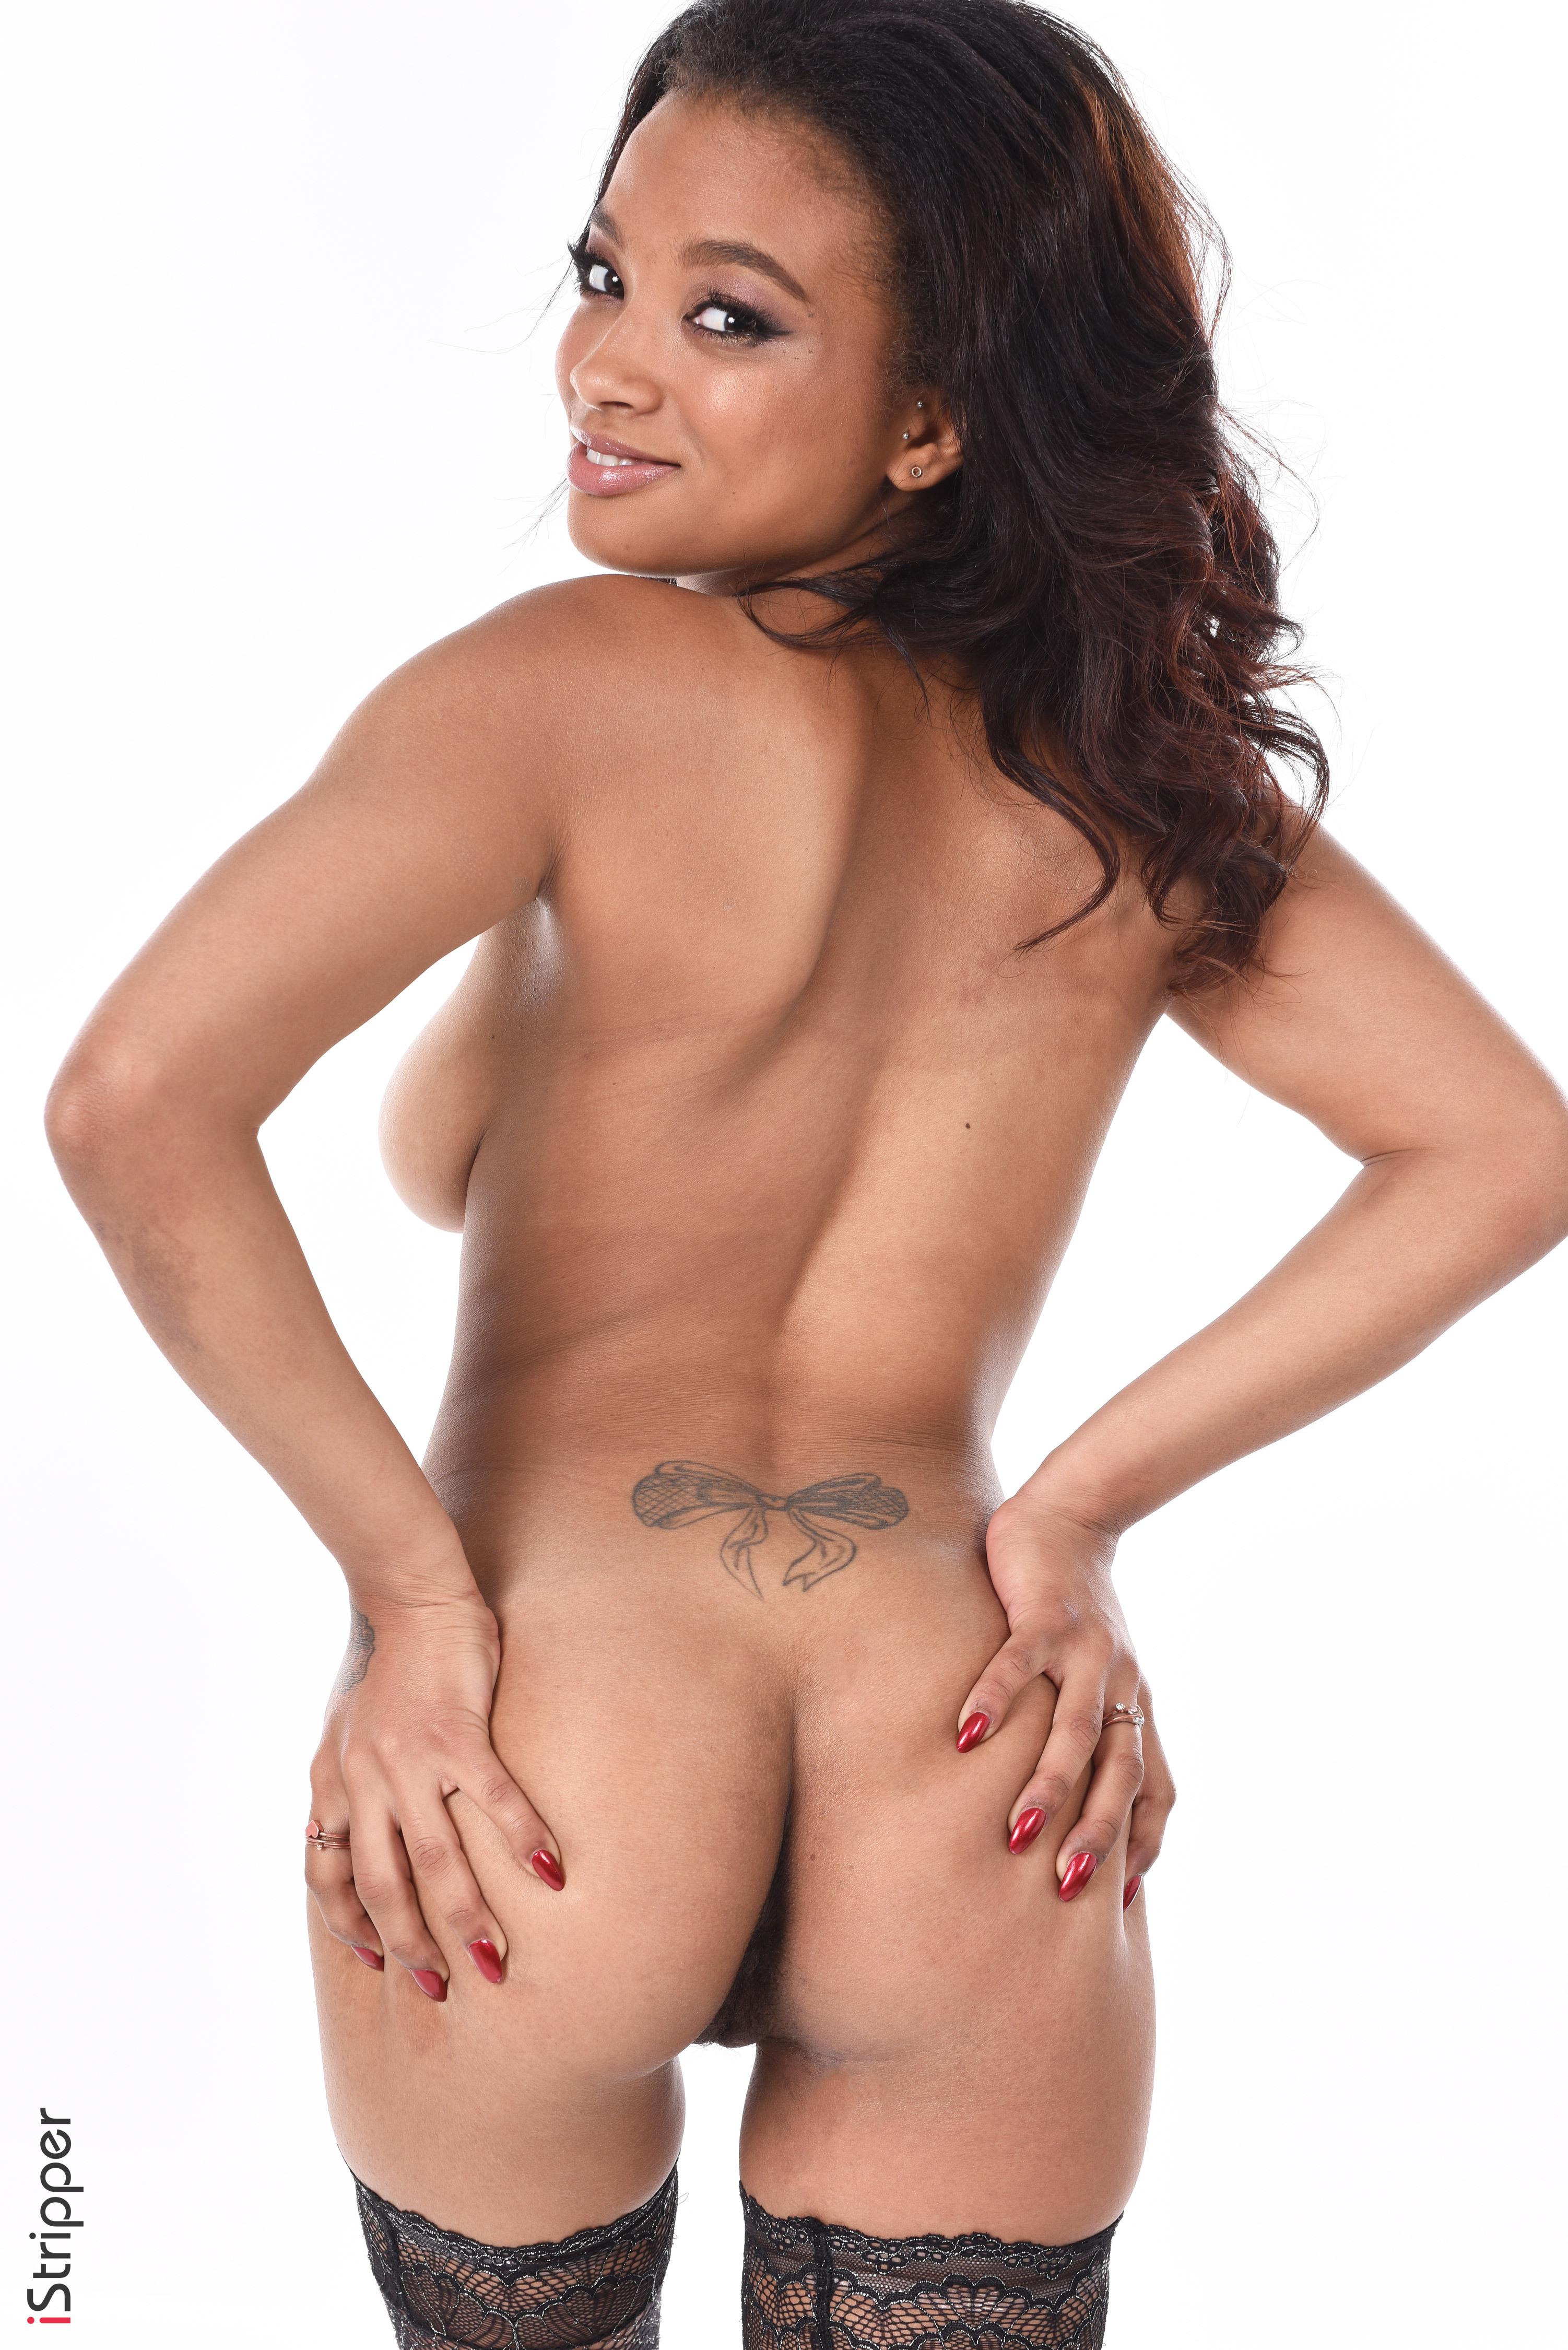 nude elizabeth banks wallpapers